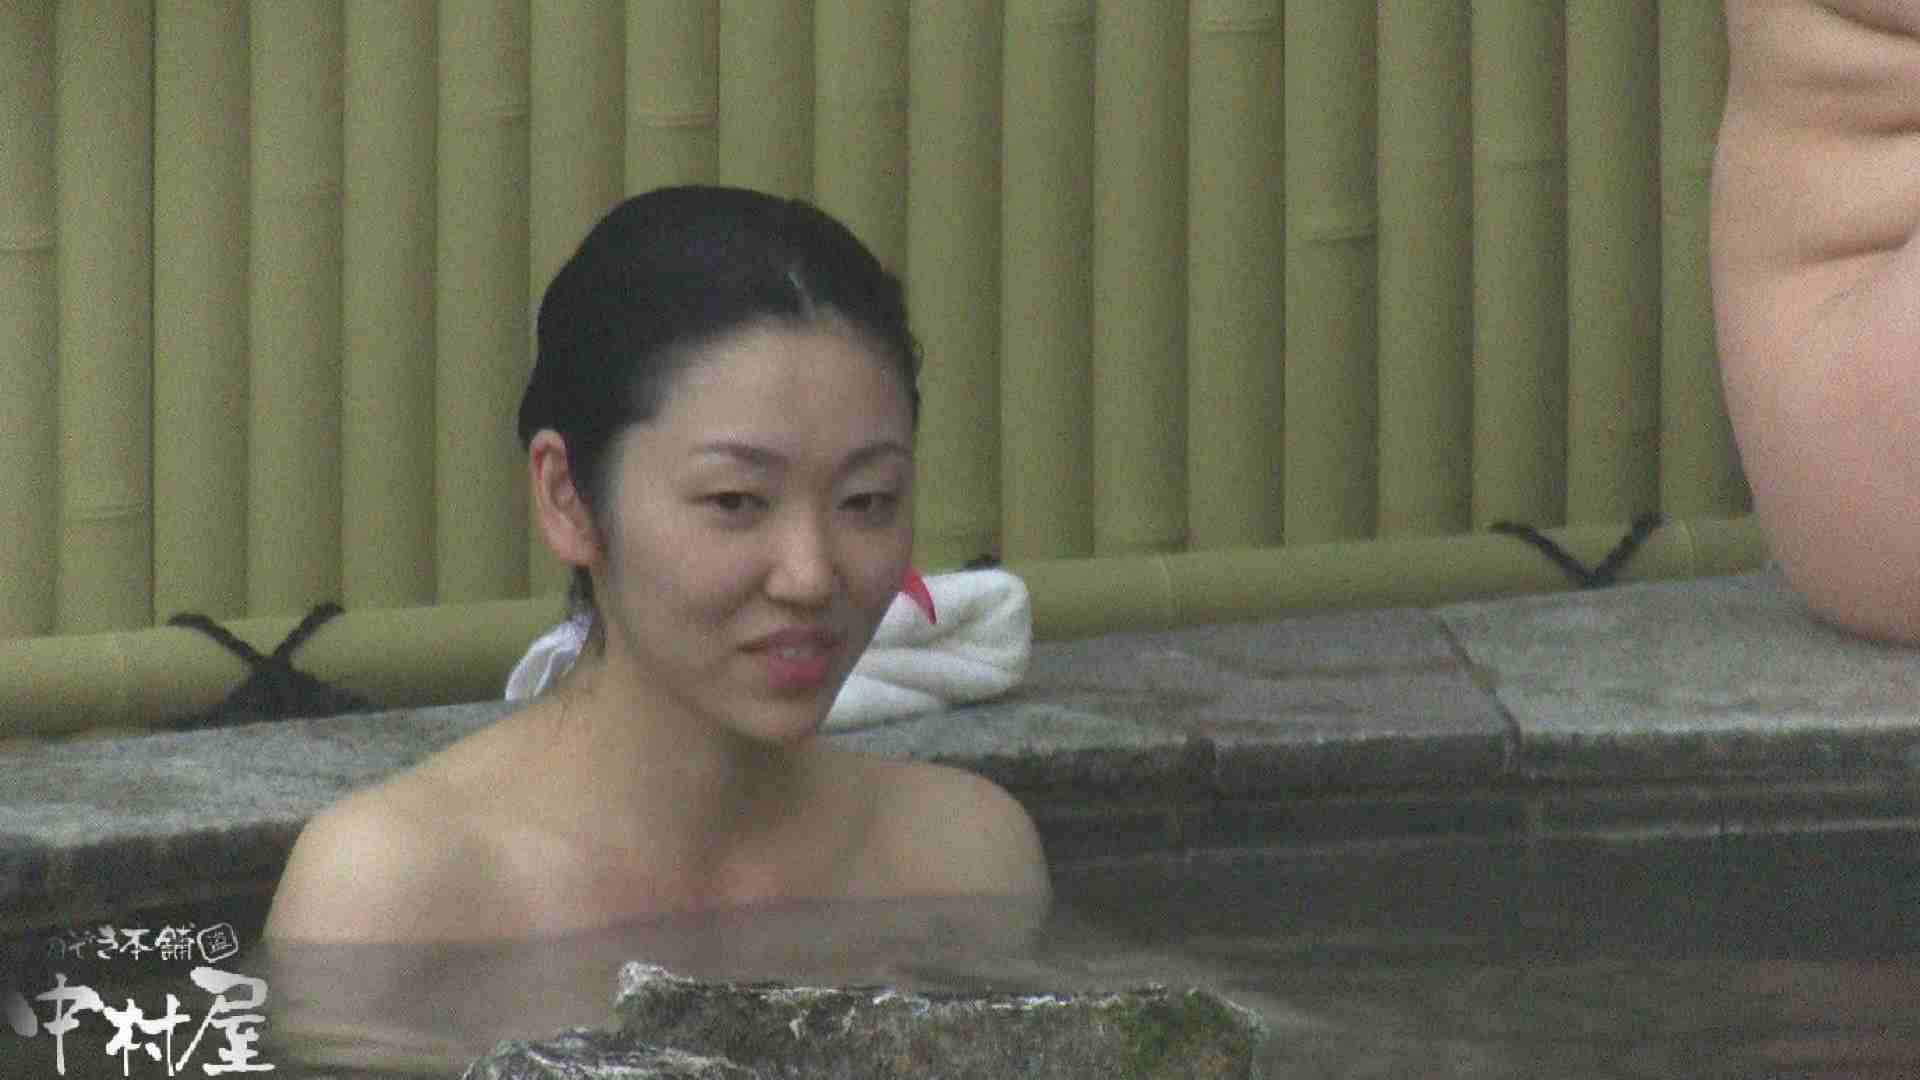 Aquaな露天風呂Vol.917 露天 セックス無修正動画無料 102画像 53